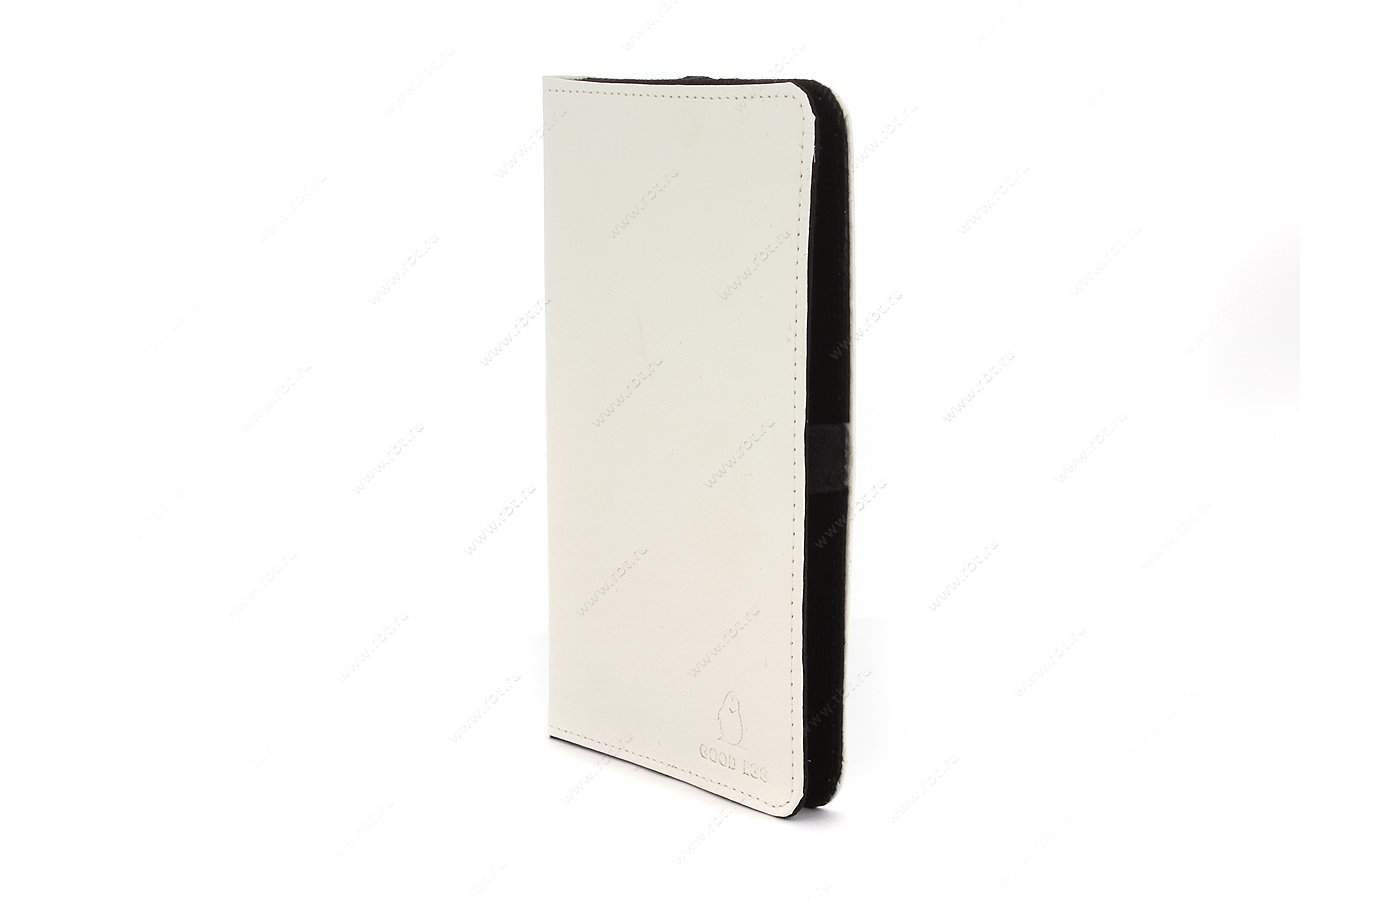 Чехол GoodEgg для PocketBook 614/624/626/640 кожа белый (GE-PB624LIR2200)